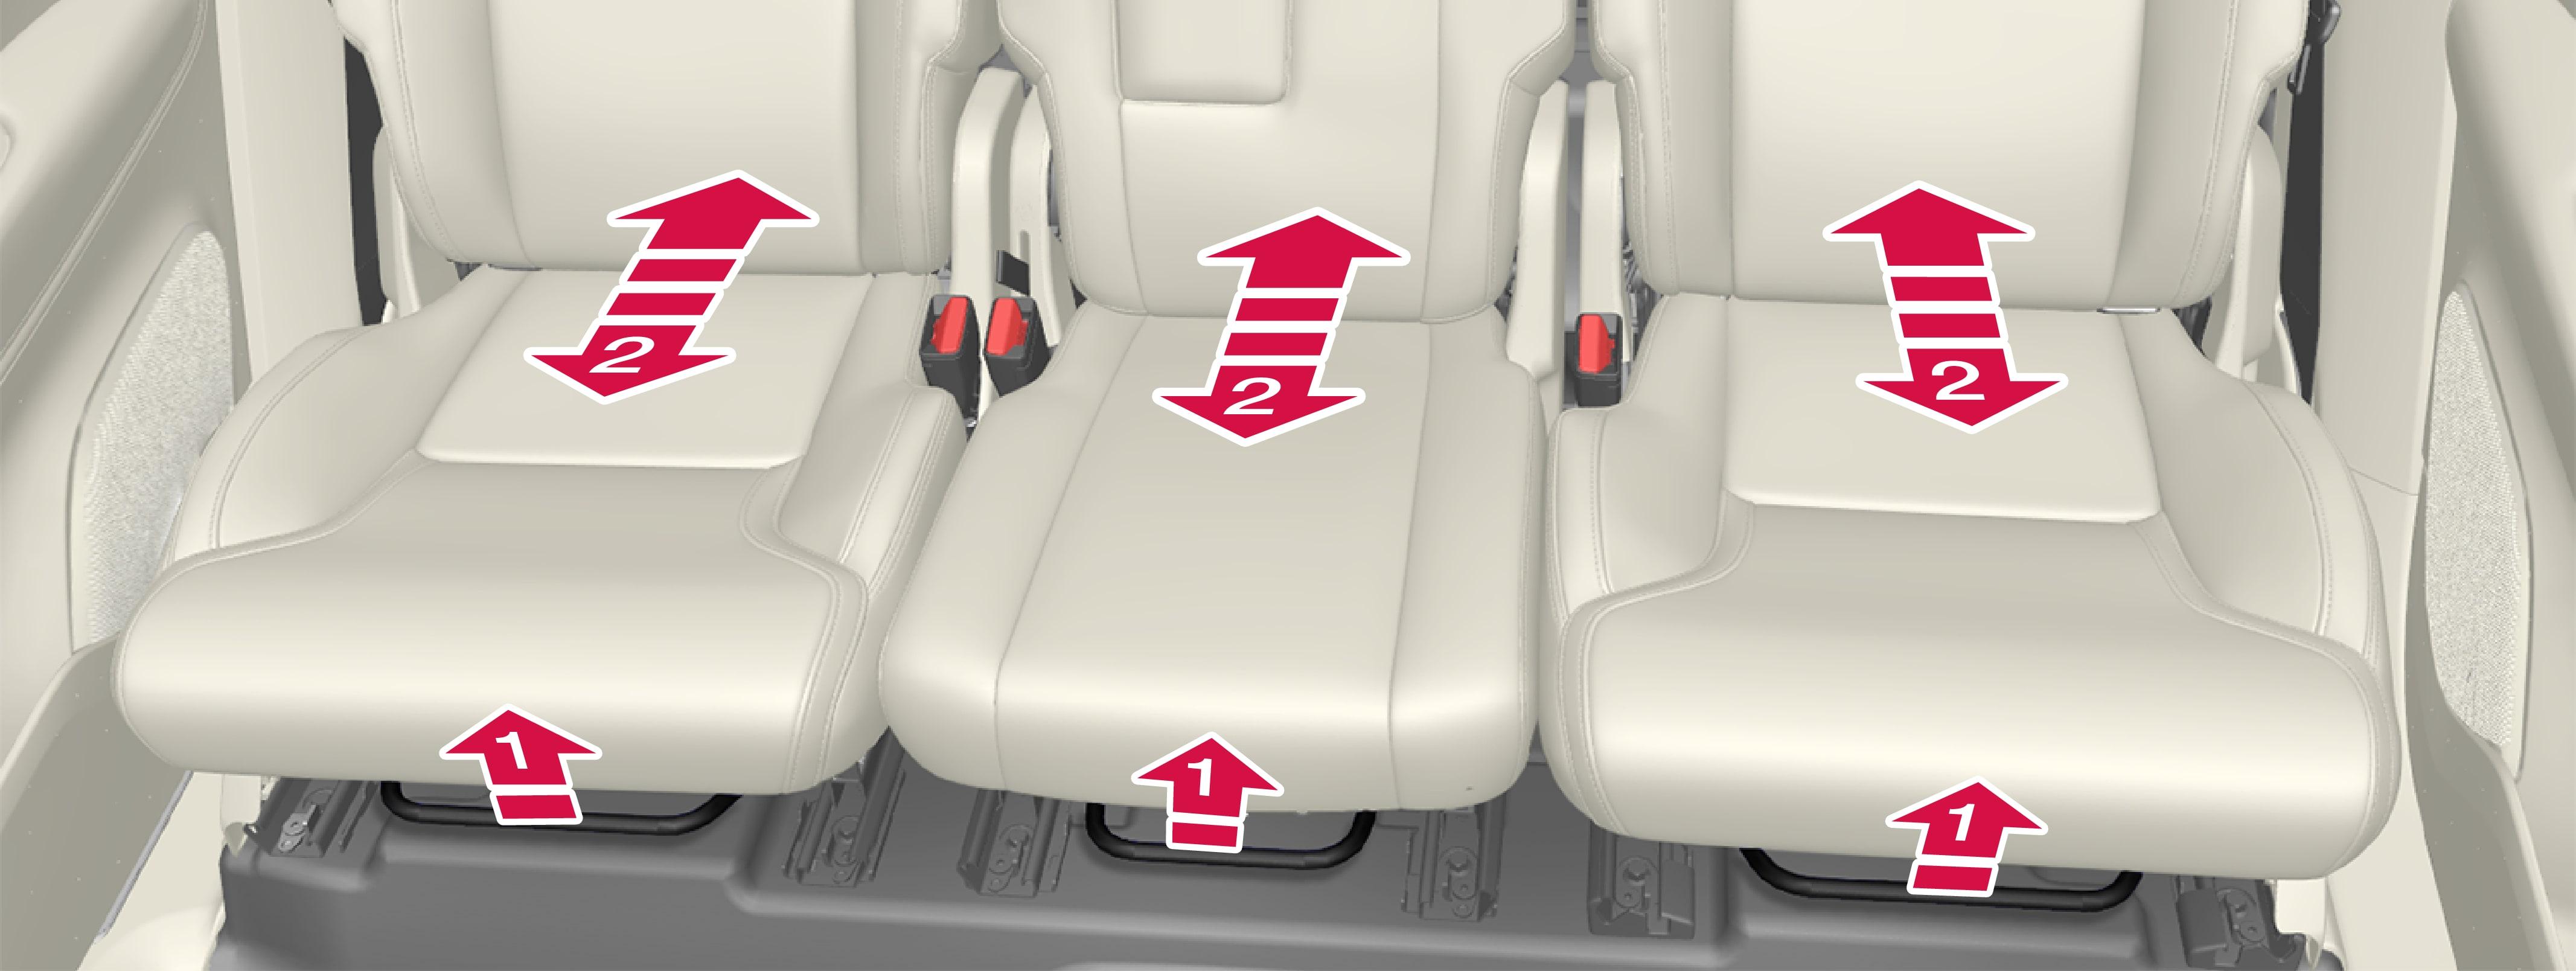 P5-1507-2nd seat row (7 seat car)-Length adjuster handle